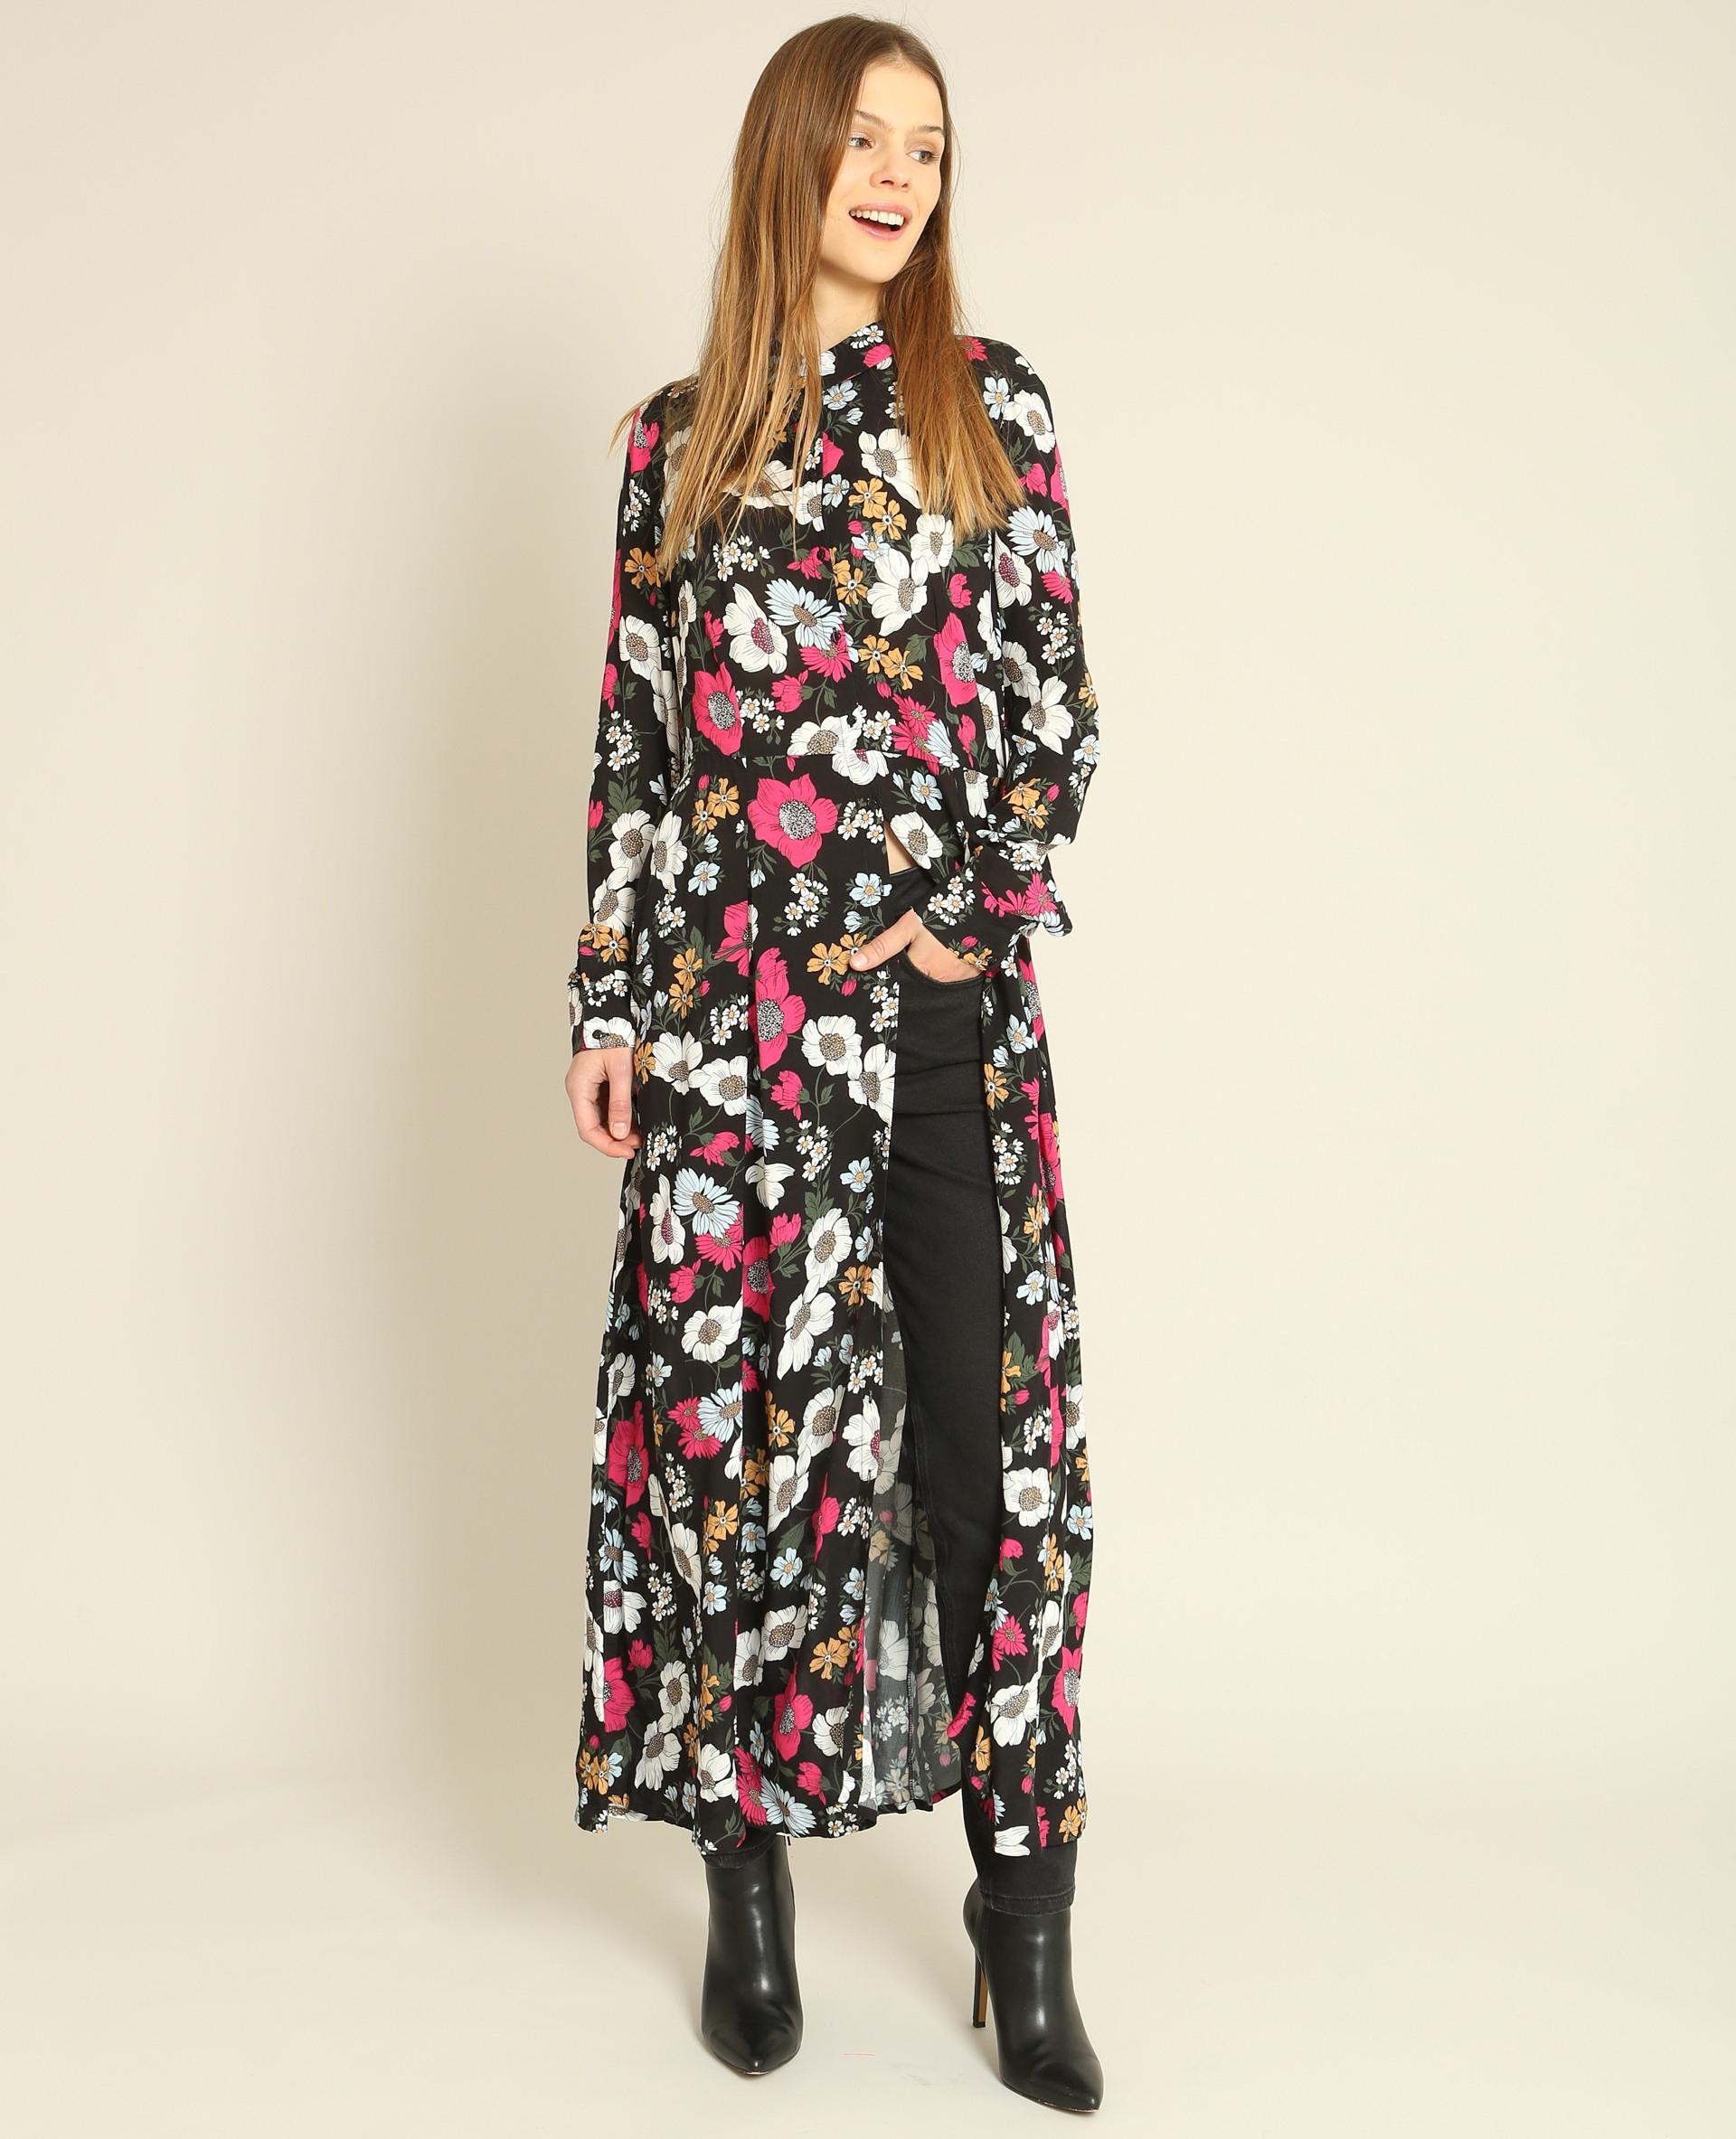 Robe Chemise Fleurie Noir  780845899E8A  Pimkie